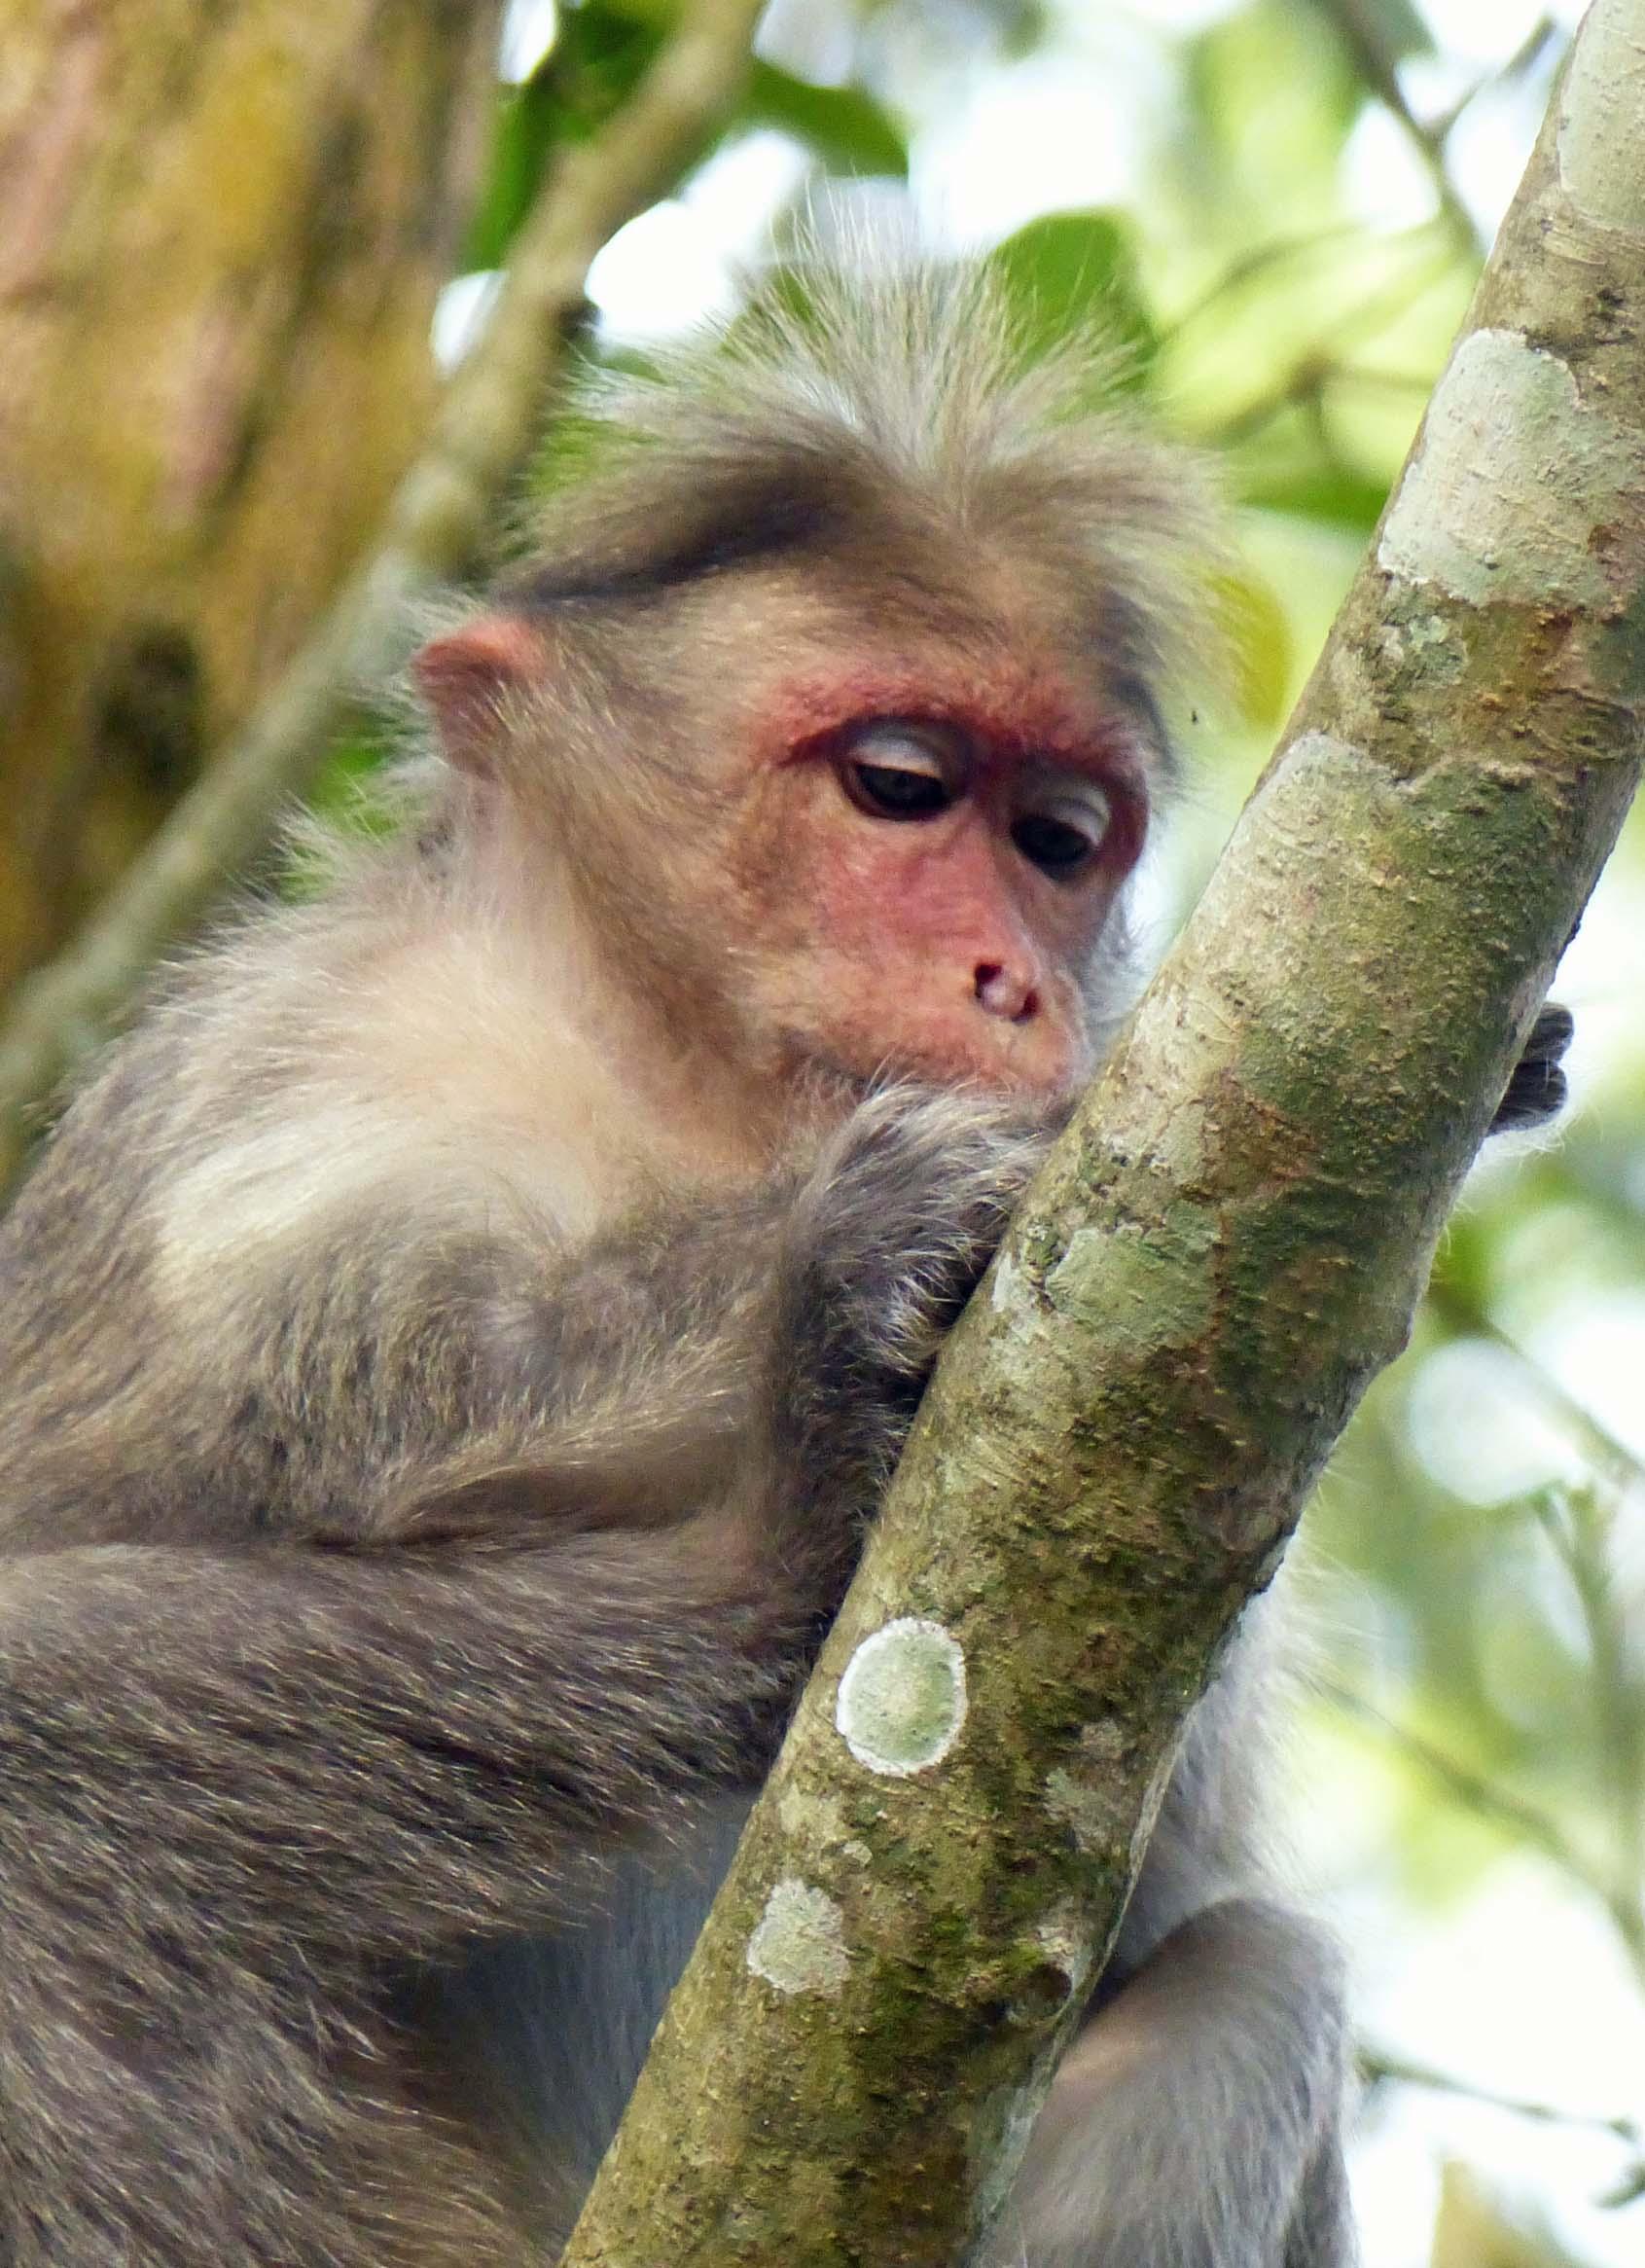 Baby monkey in a tree